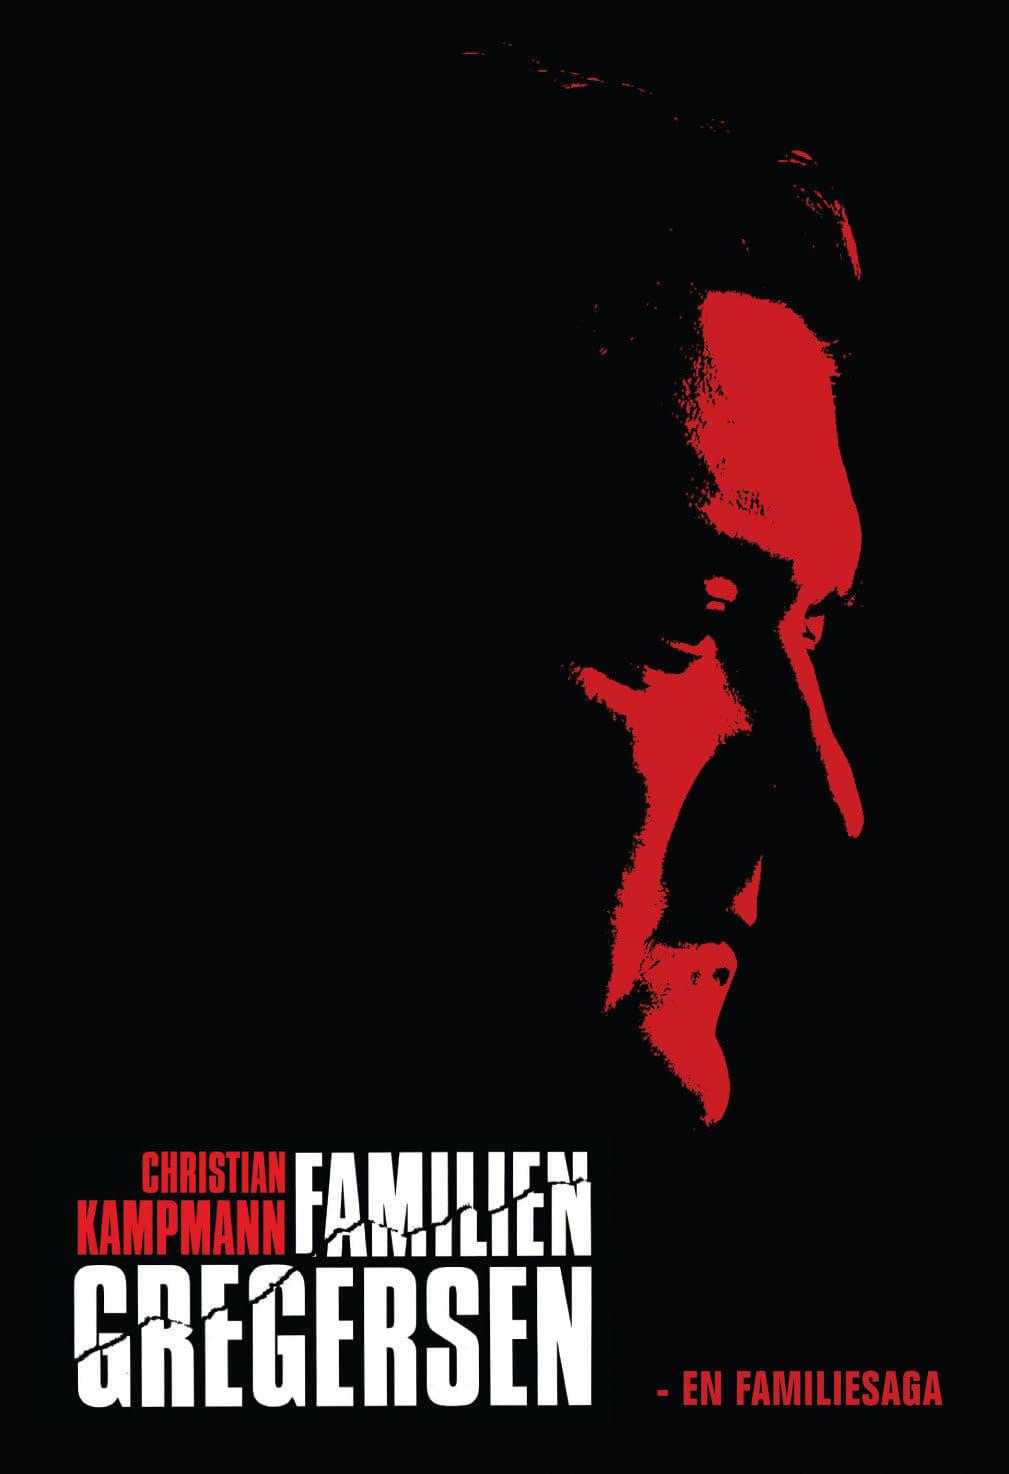 Rene Linier / Andre Måder